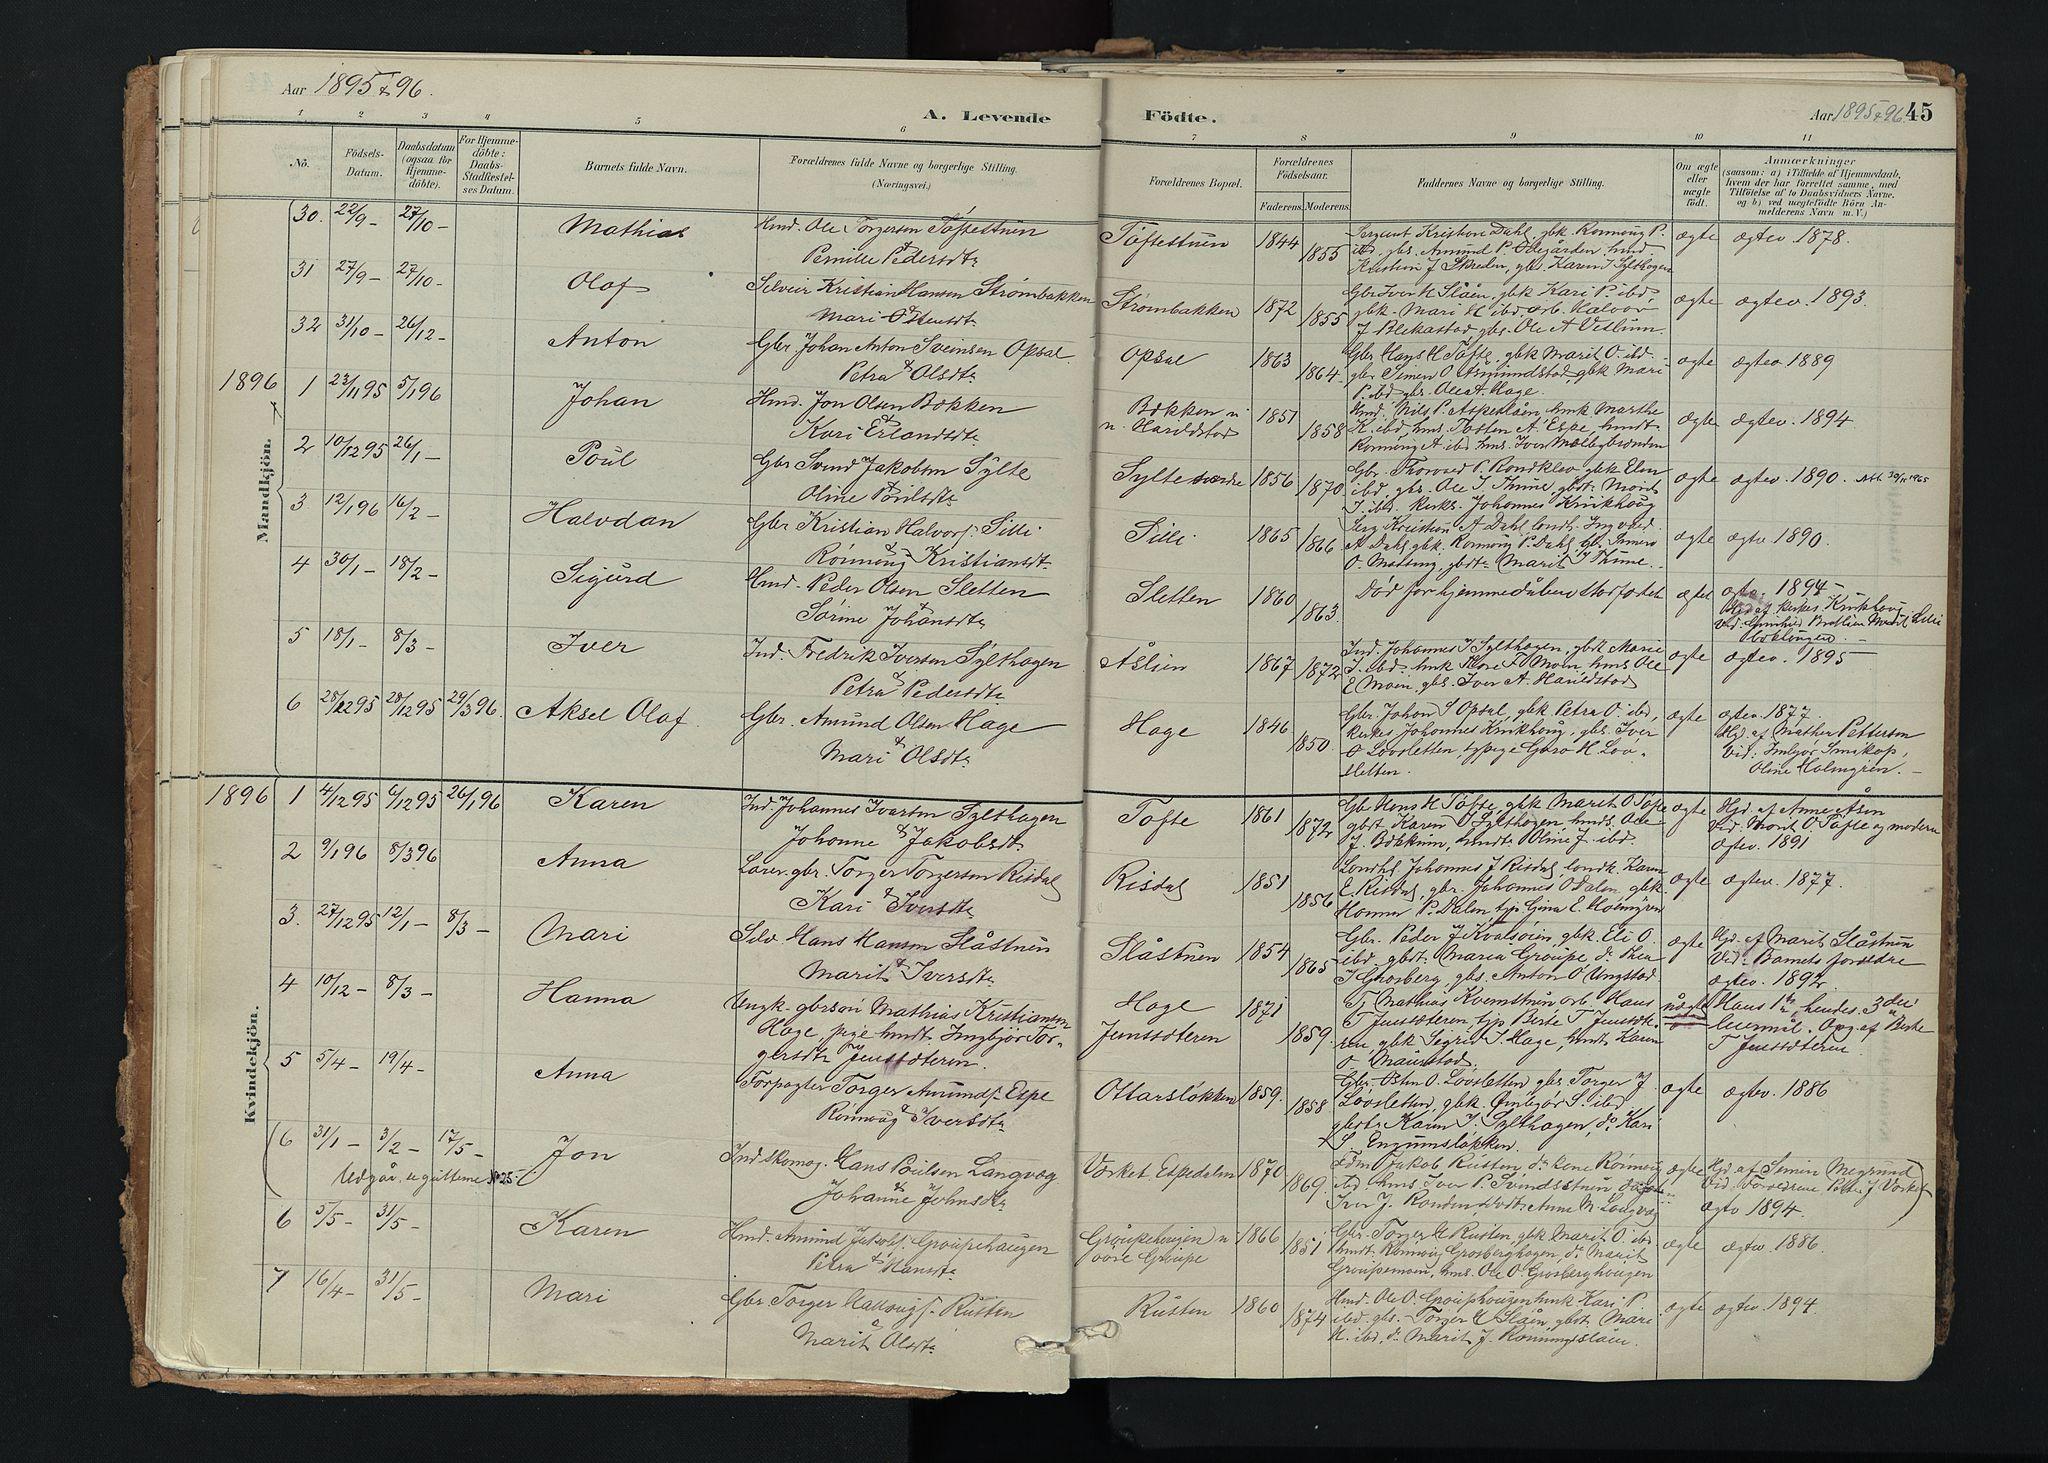 SAH, Nord-Fron prestekontor, Ministerialbok nr. 5, 1884-1914, s. 45